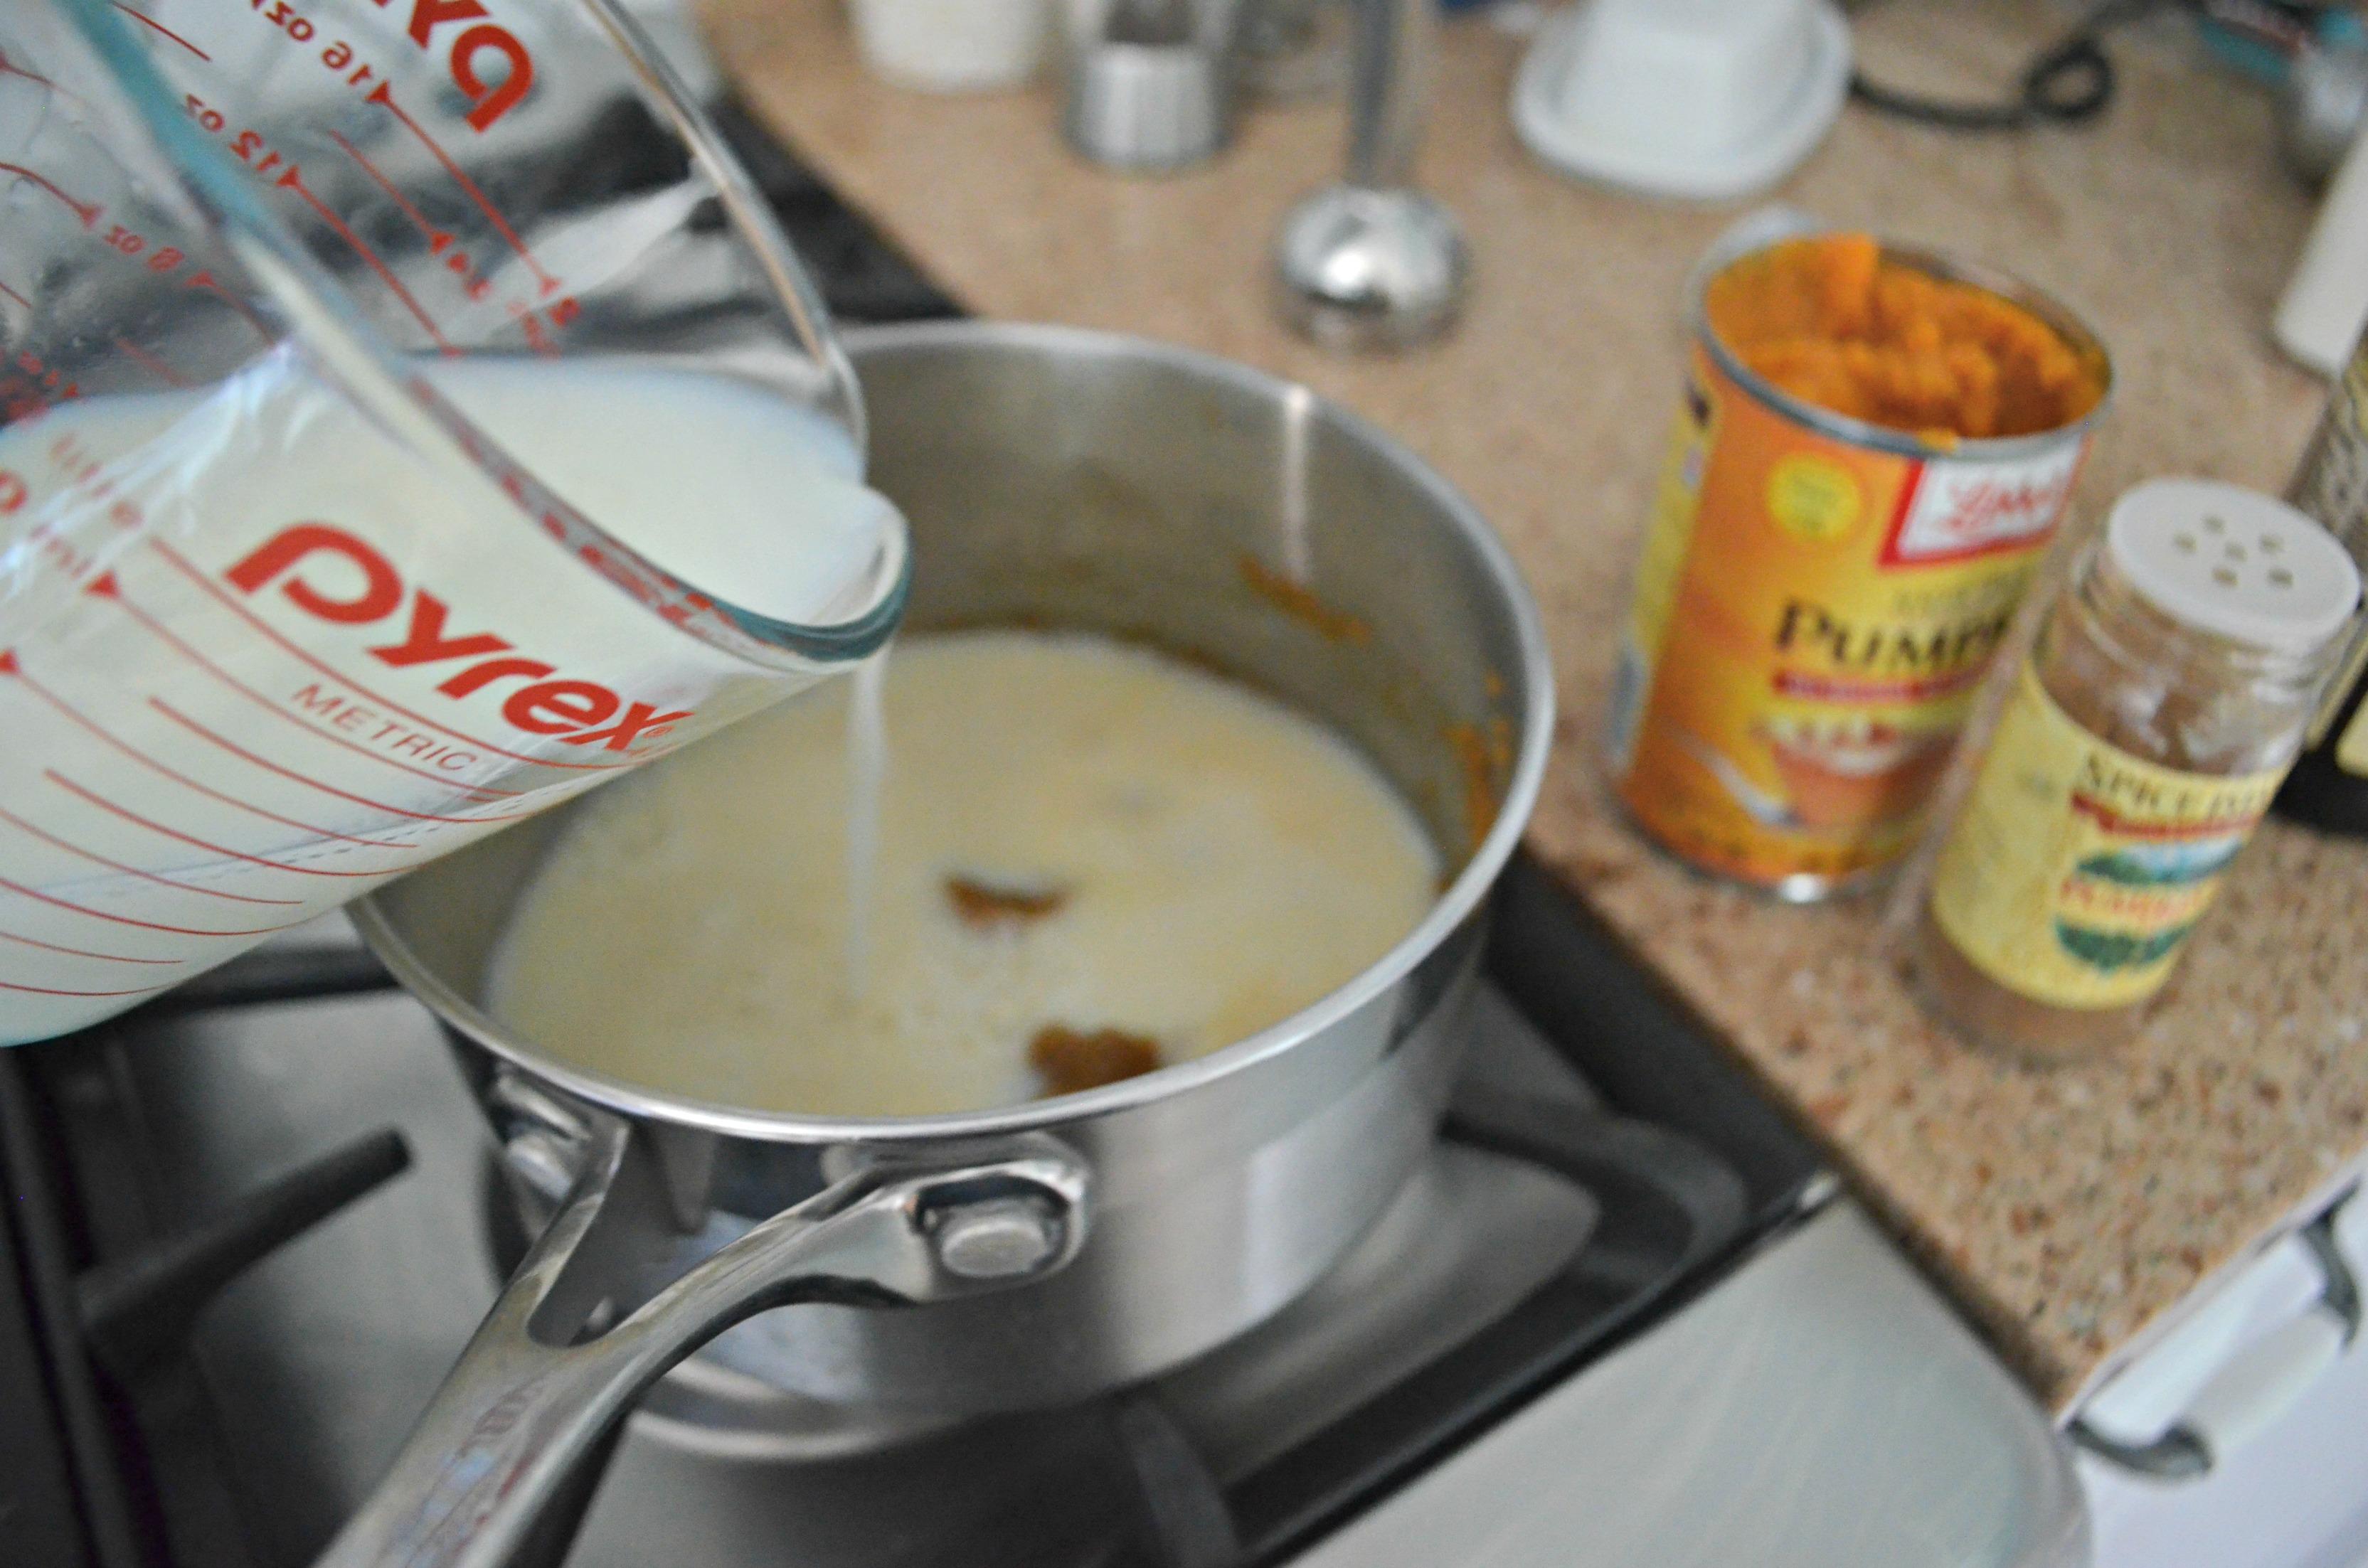 DIY Pumpkin Spice Latte - adding ingredients to a pan